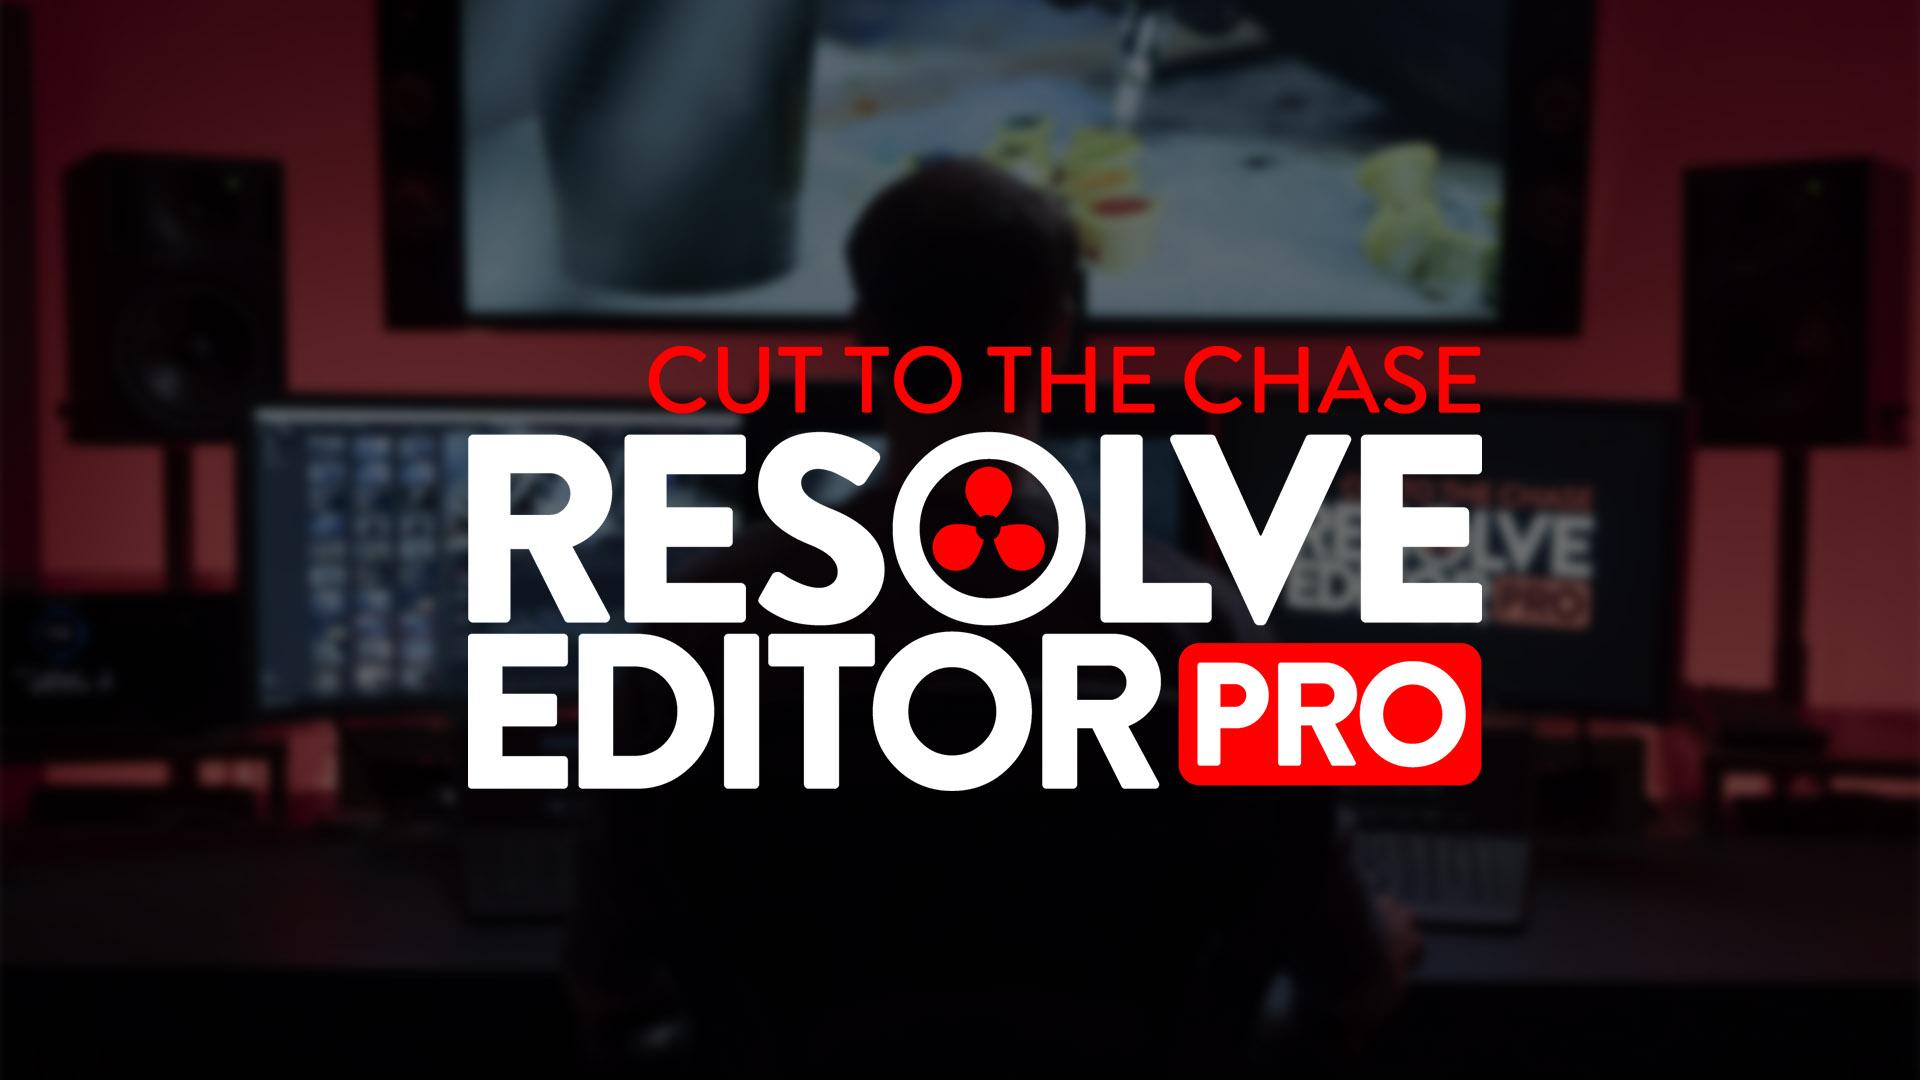 Resolve Editor Proオンラインコース - DaVinci Resolveへの乗り換えを支援